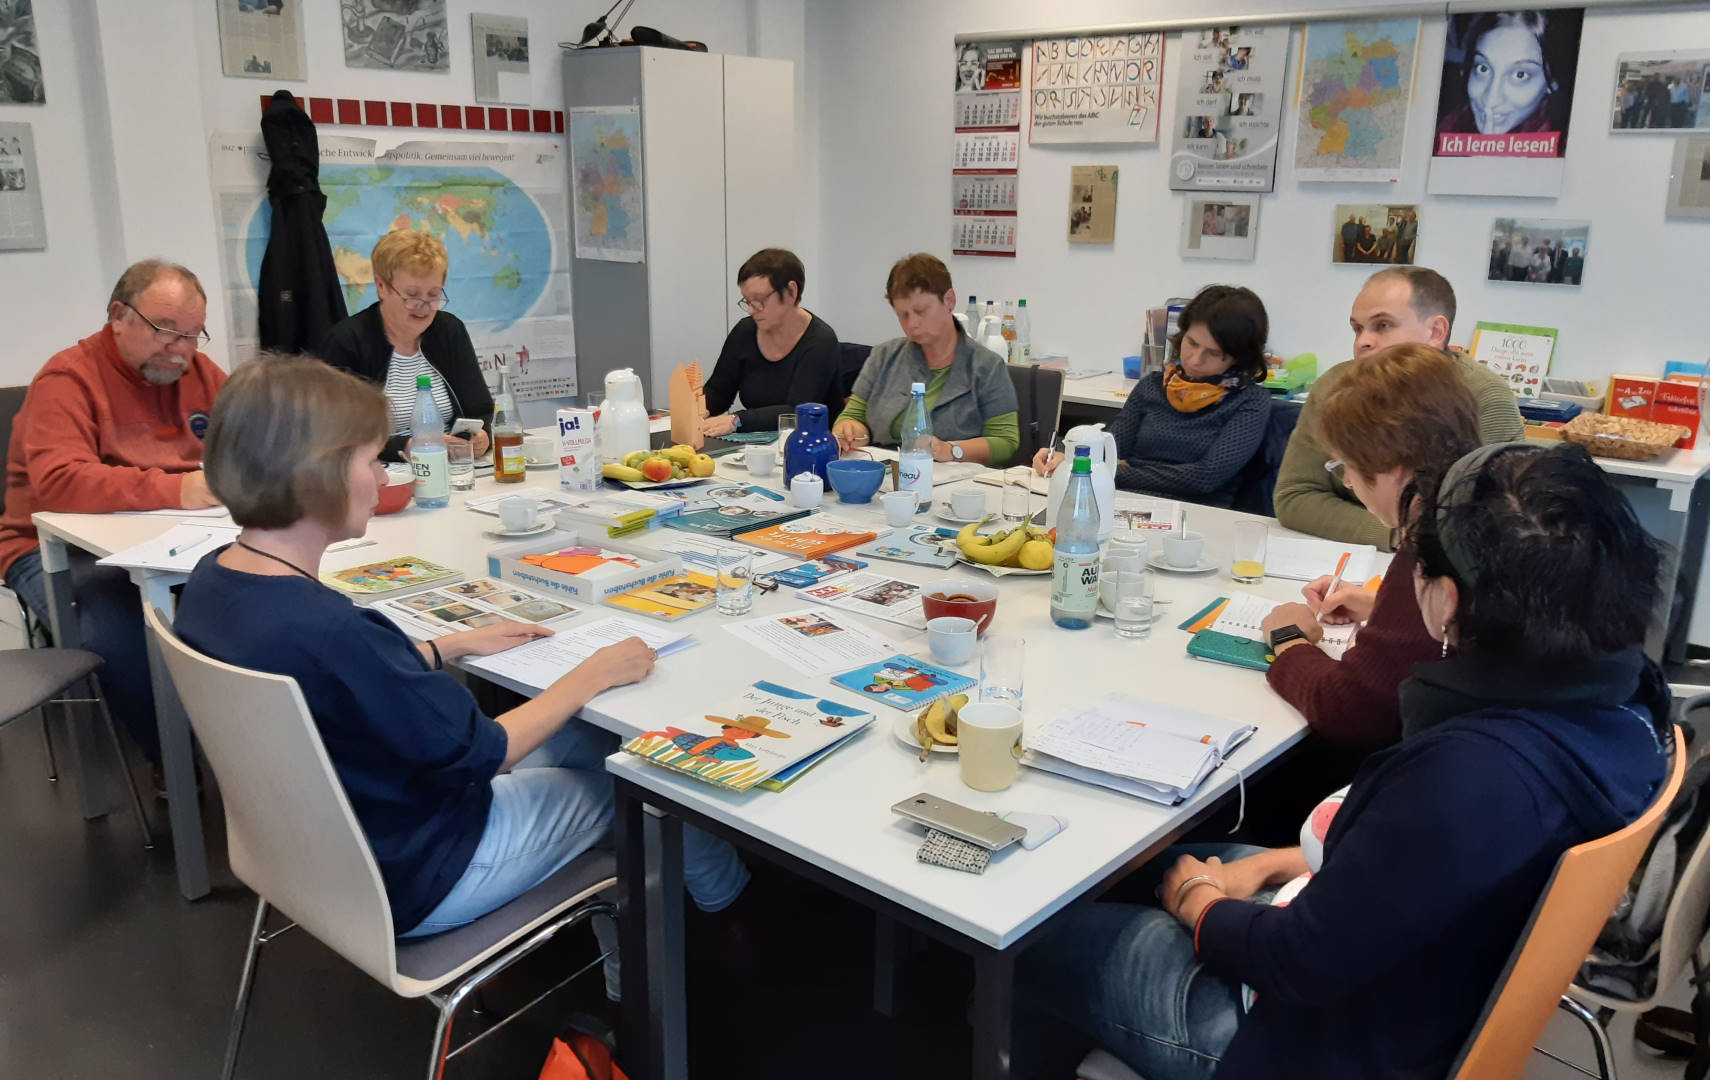 Kathleen Bleßmann präsentiert Offene Lernwerkstätten